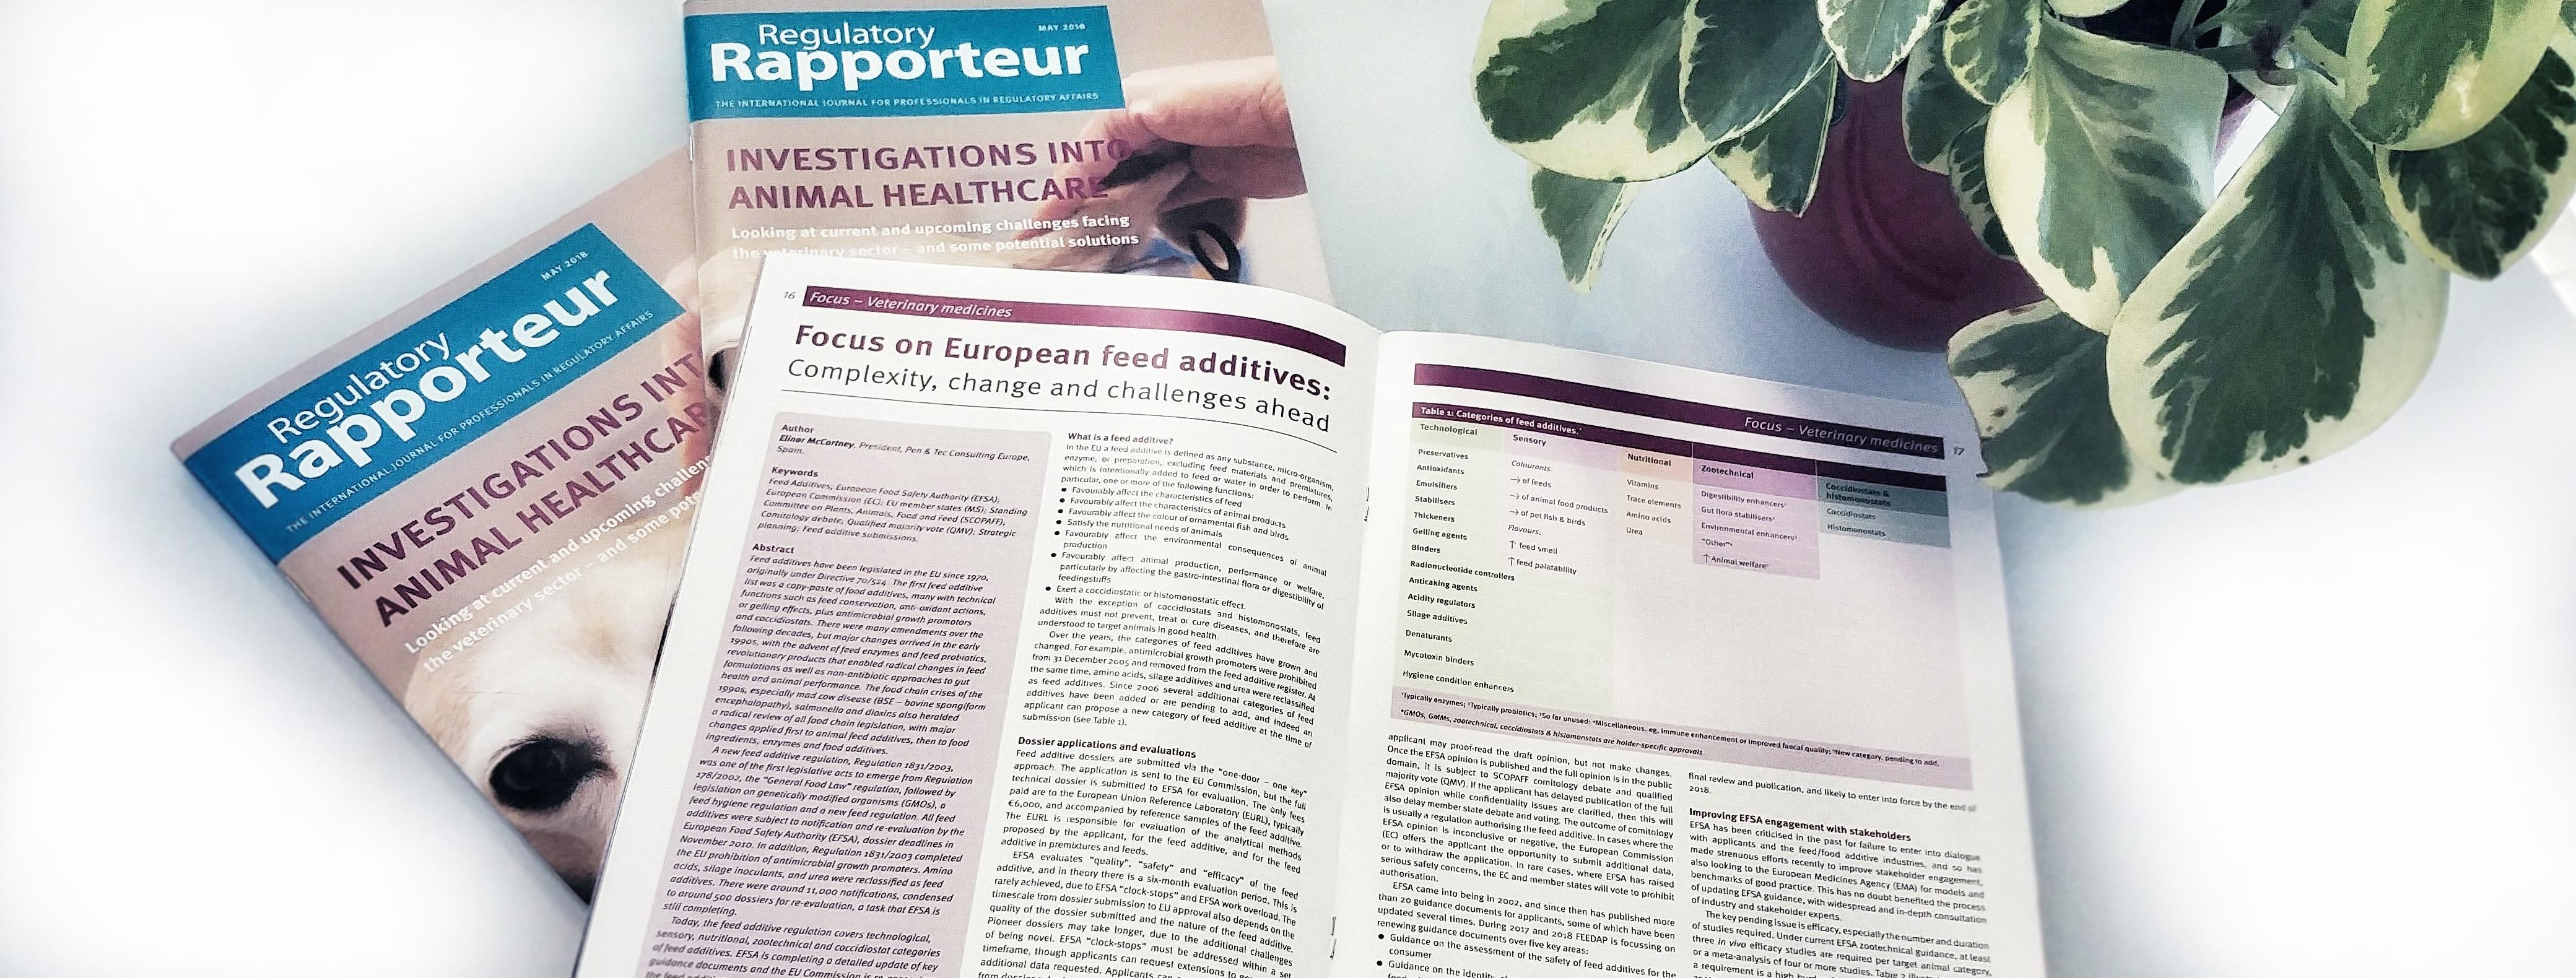 Focus on European feed additives